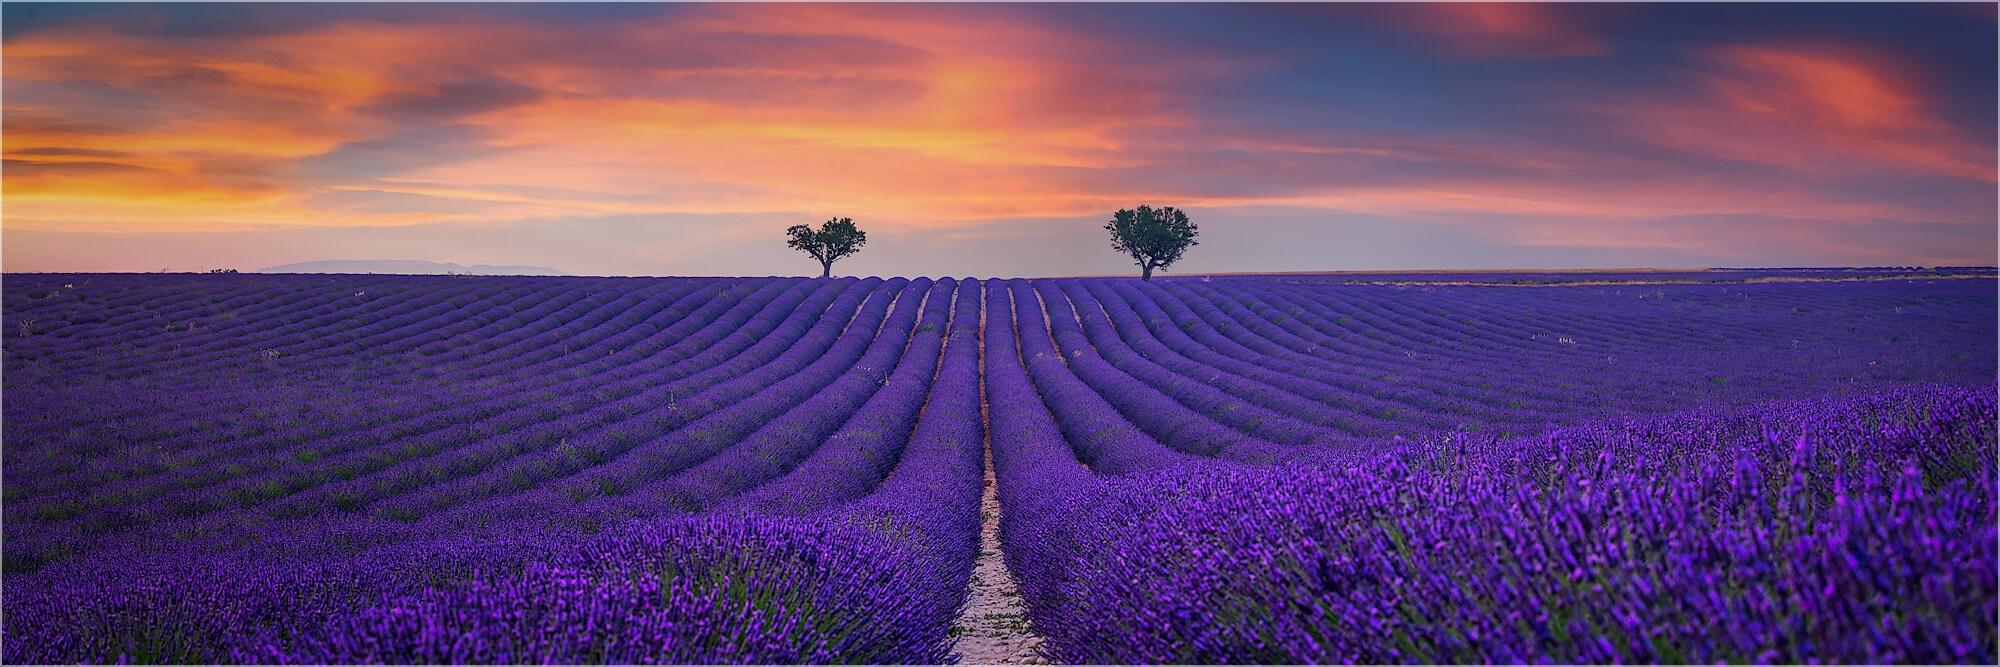 Panoramabild Sonnenuntergang im Lavendelfeld Provence